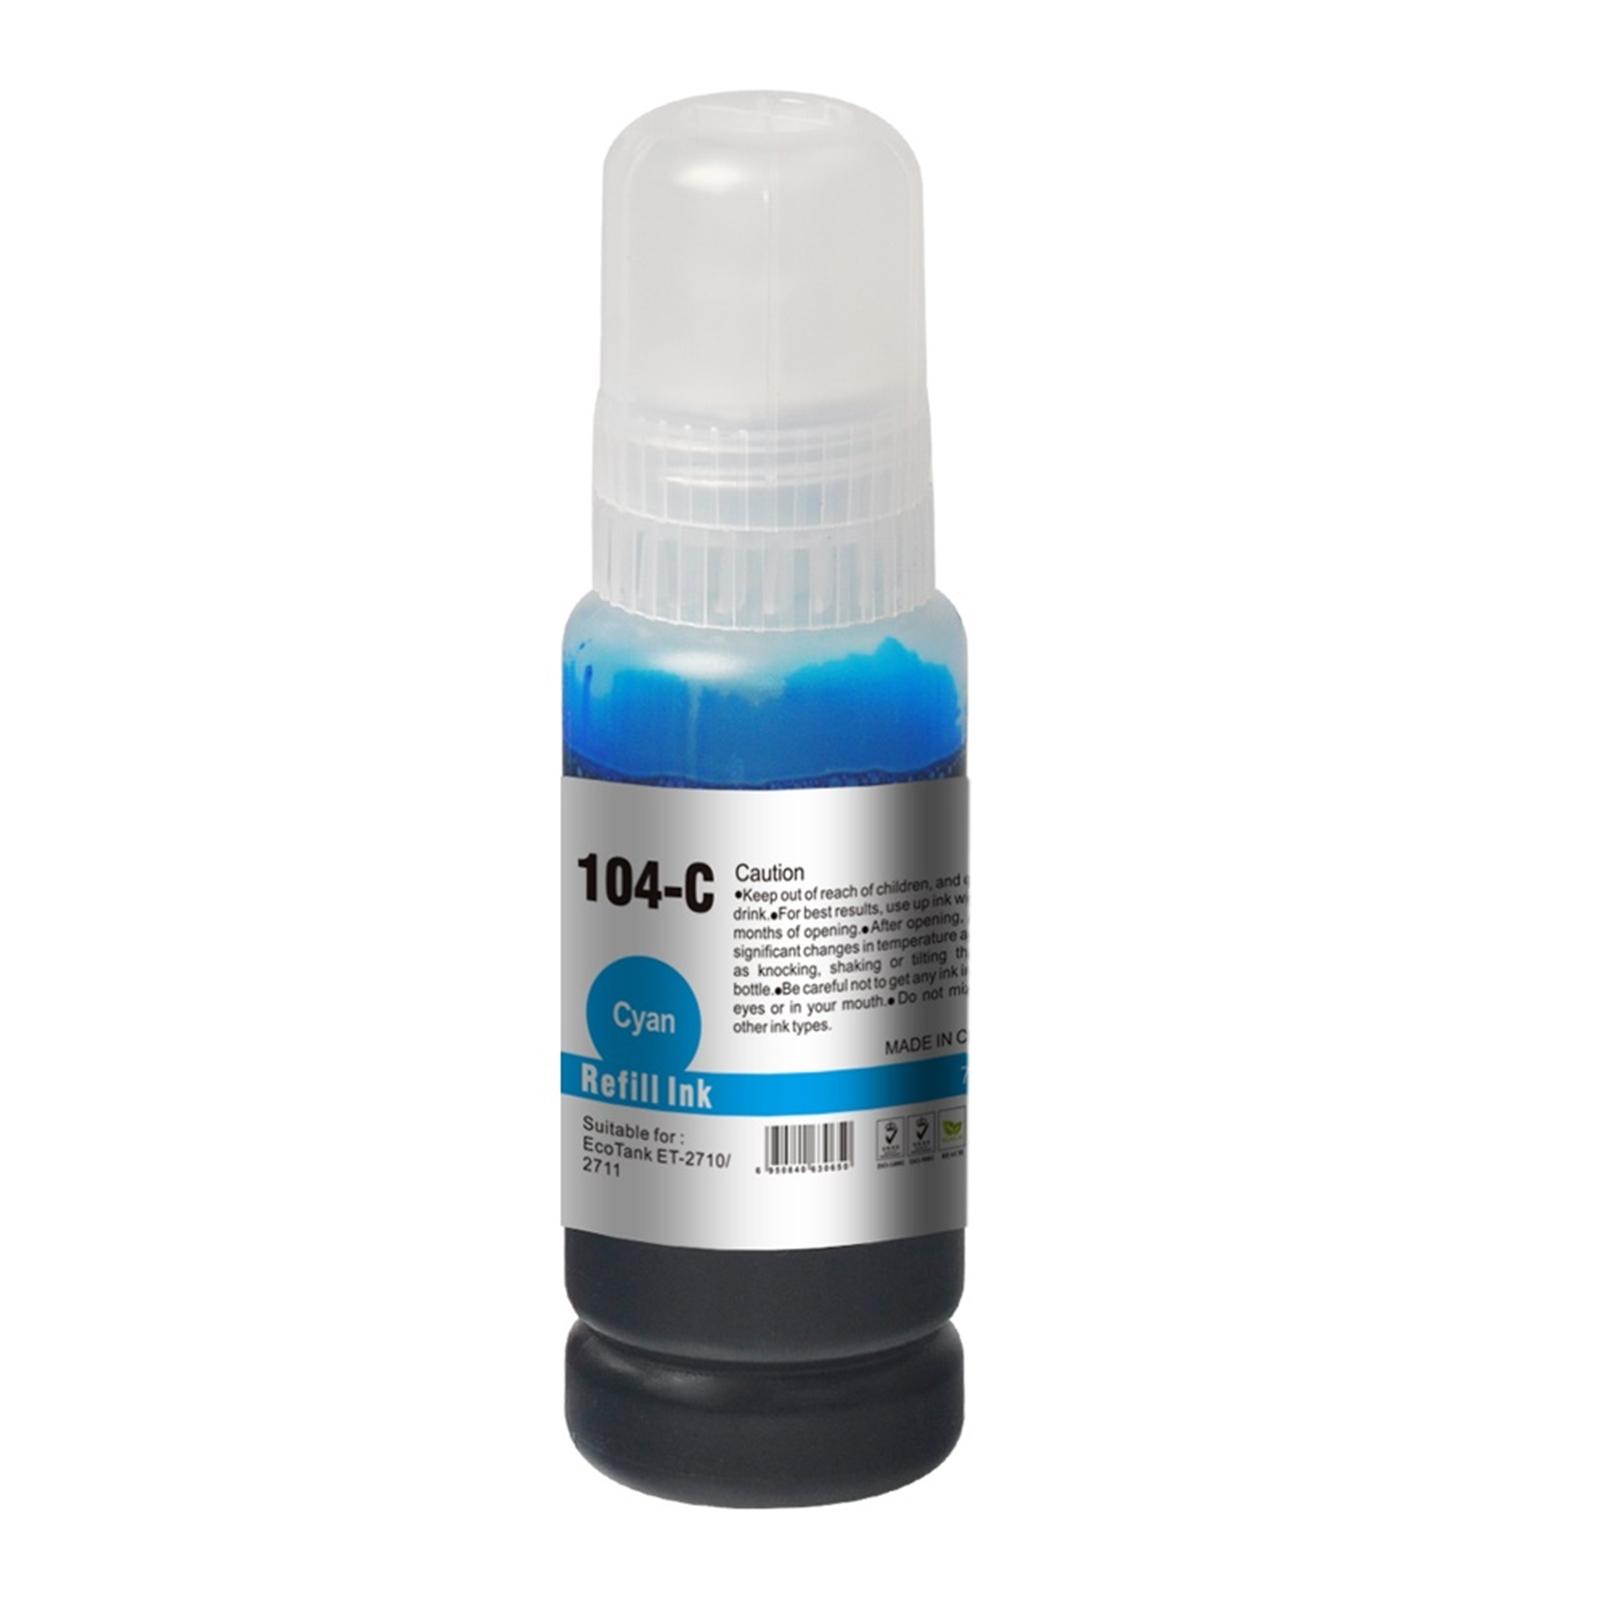 InkLab 104 Epson Compatible EcoTank Cyan ink bottle